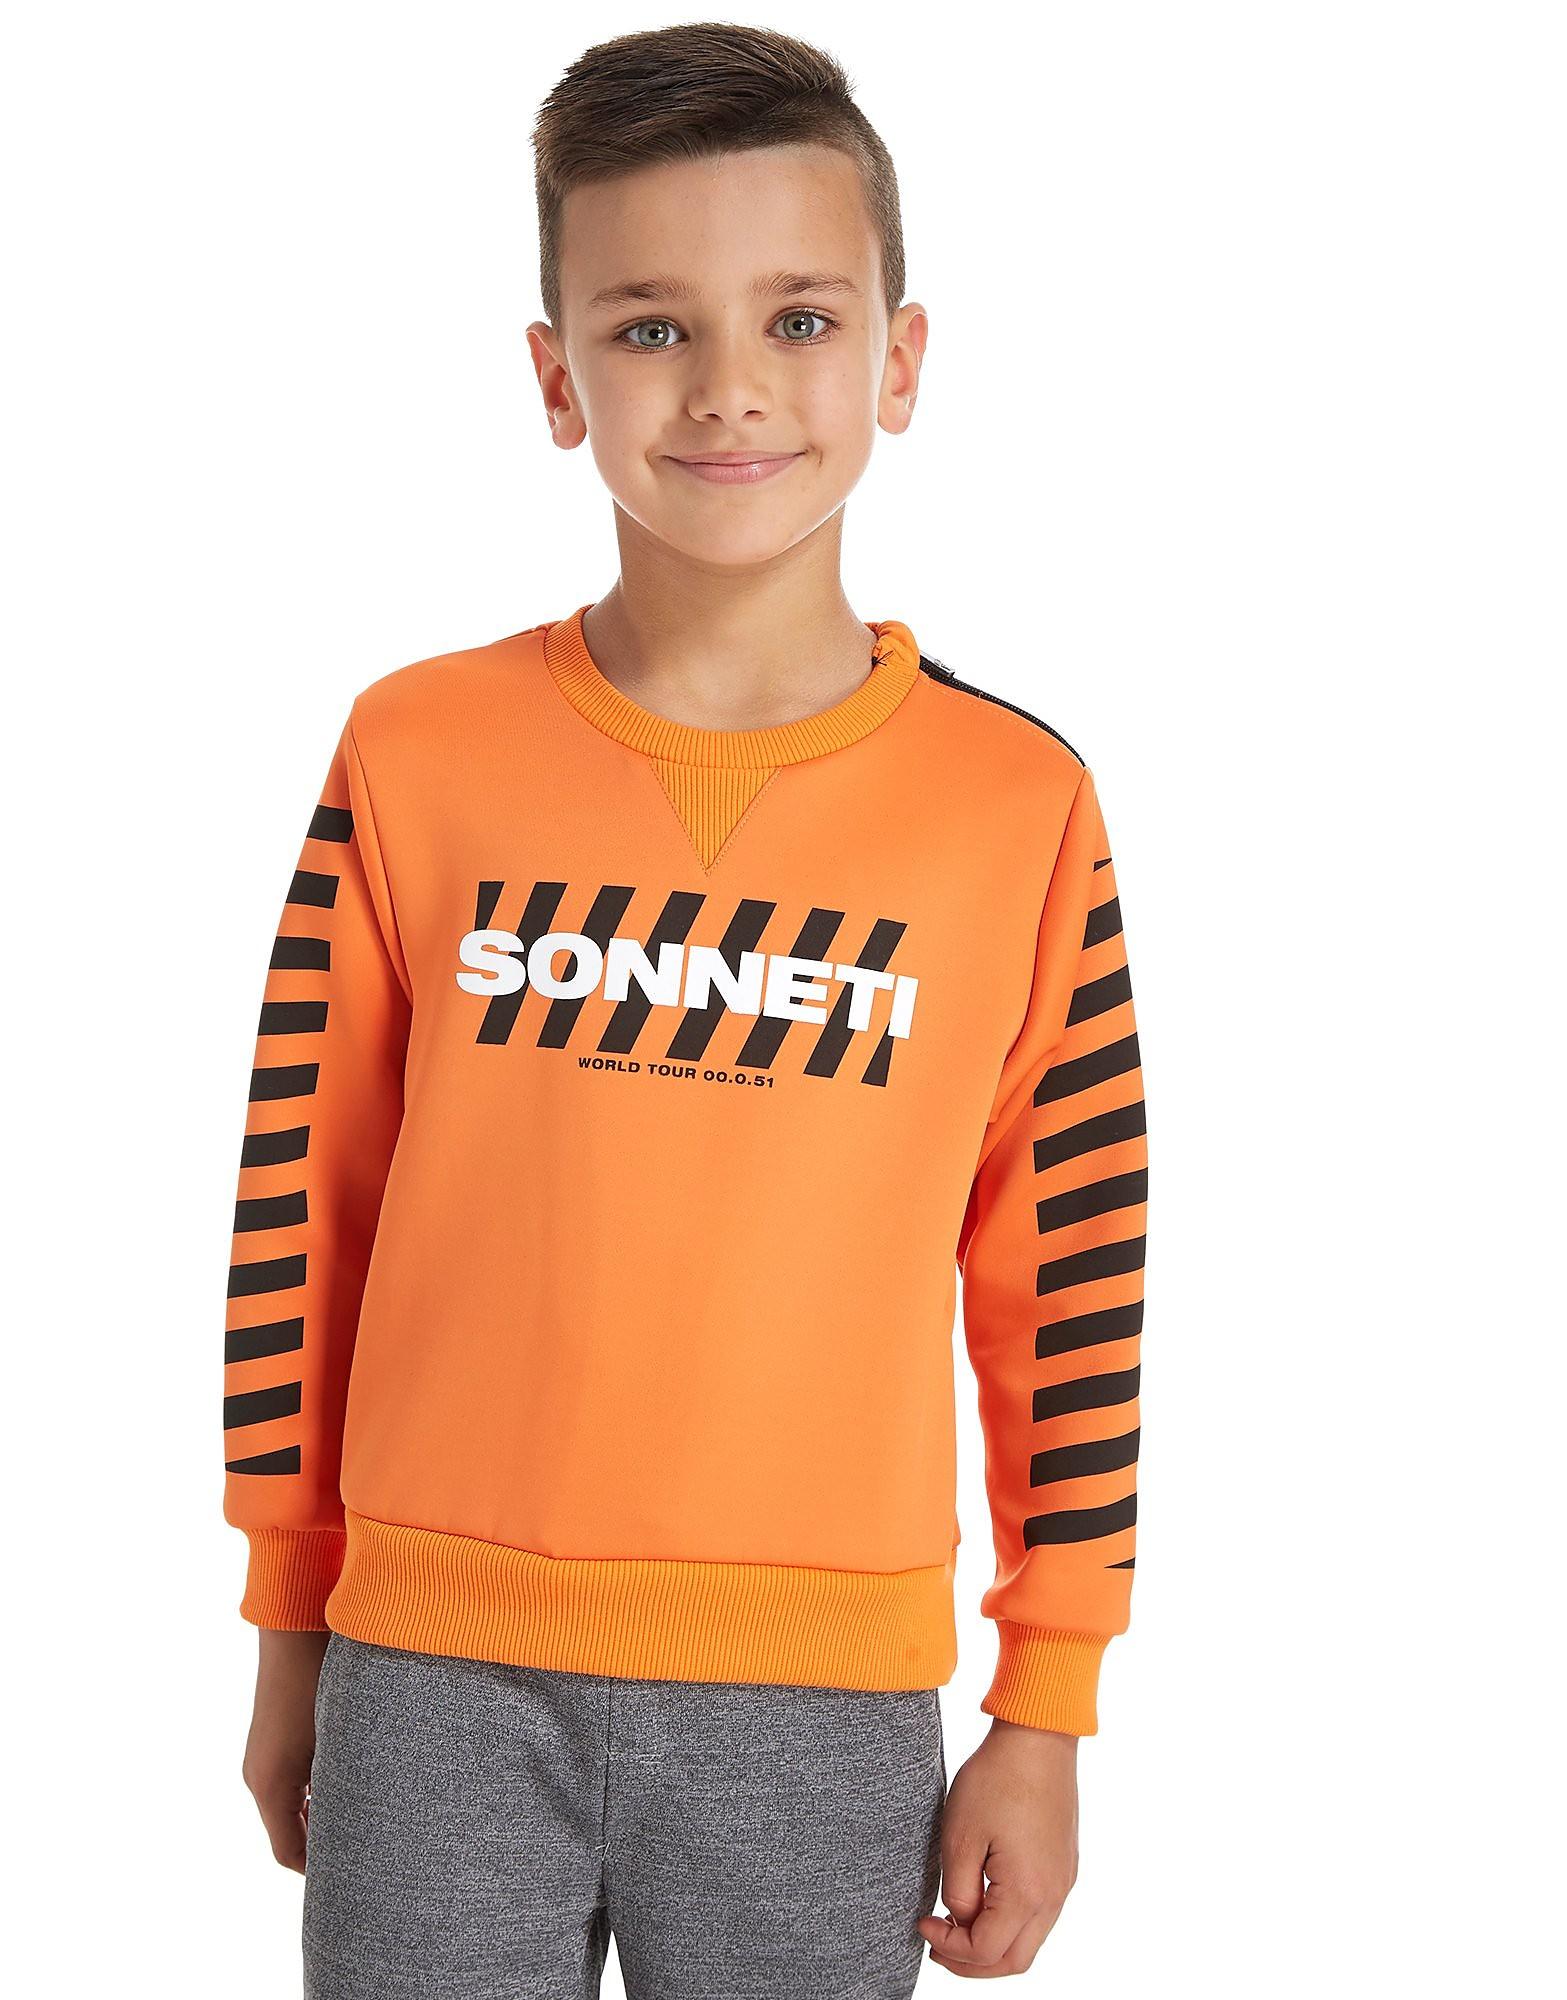 Sonneti Blade Run Sweatshirt Childrens